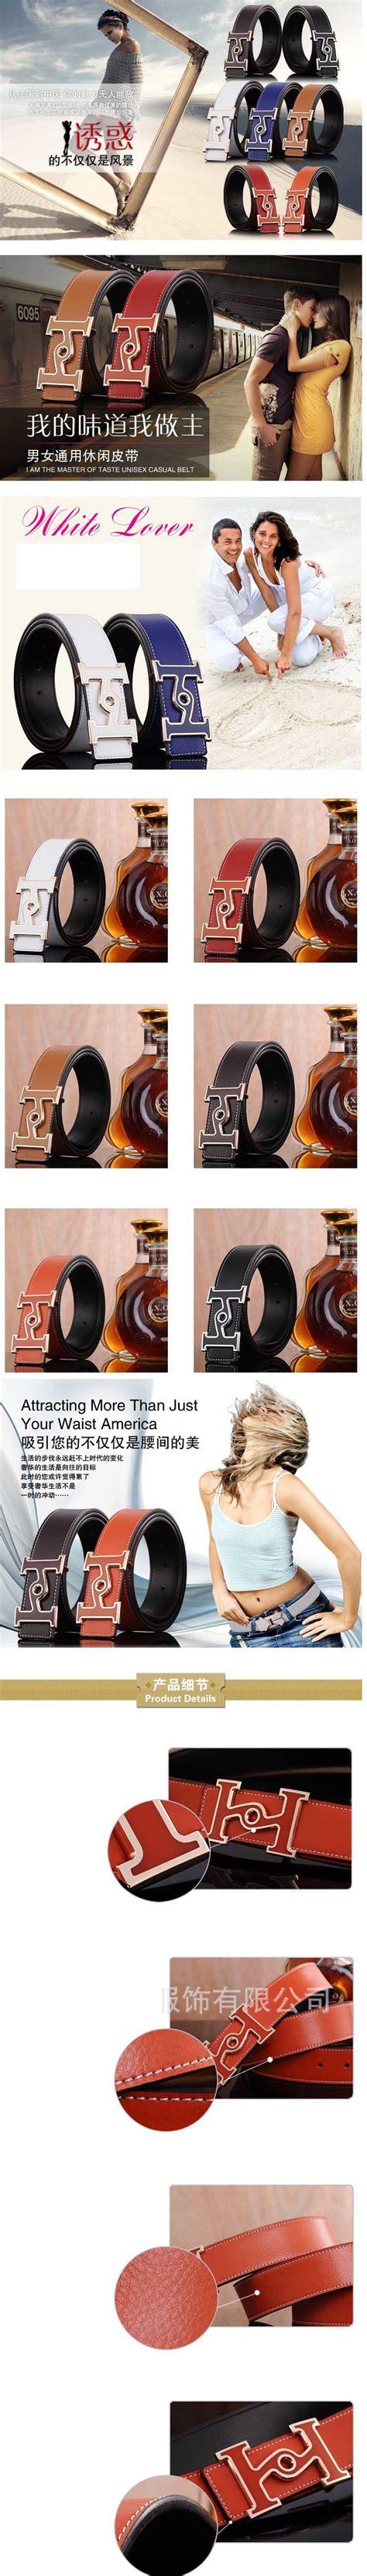 Sabuk Branded Hermes White Edition Import jual sabuk hermes non original